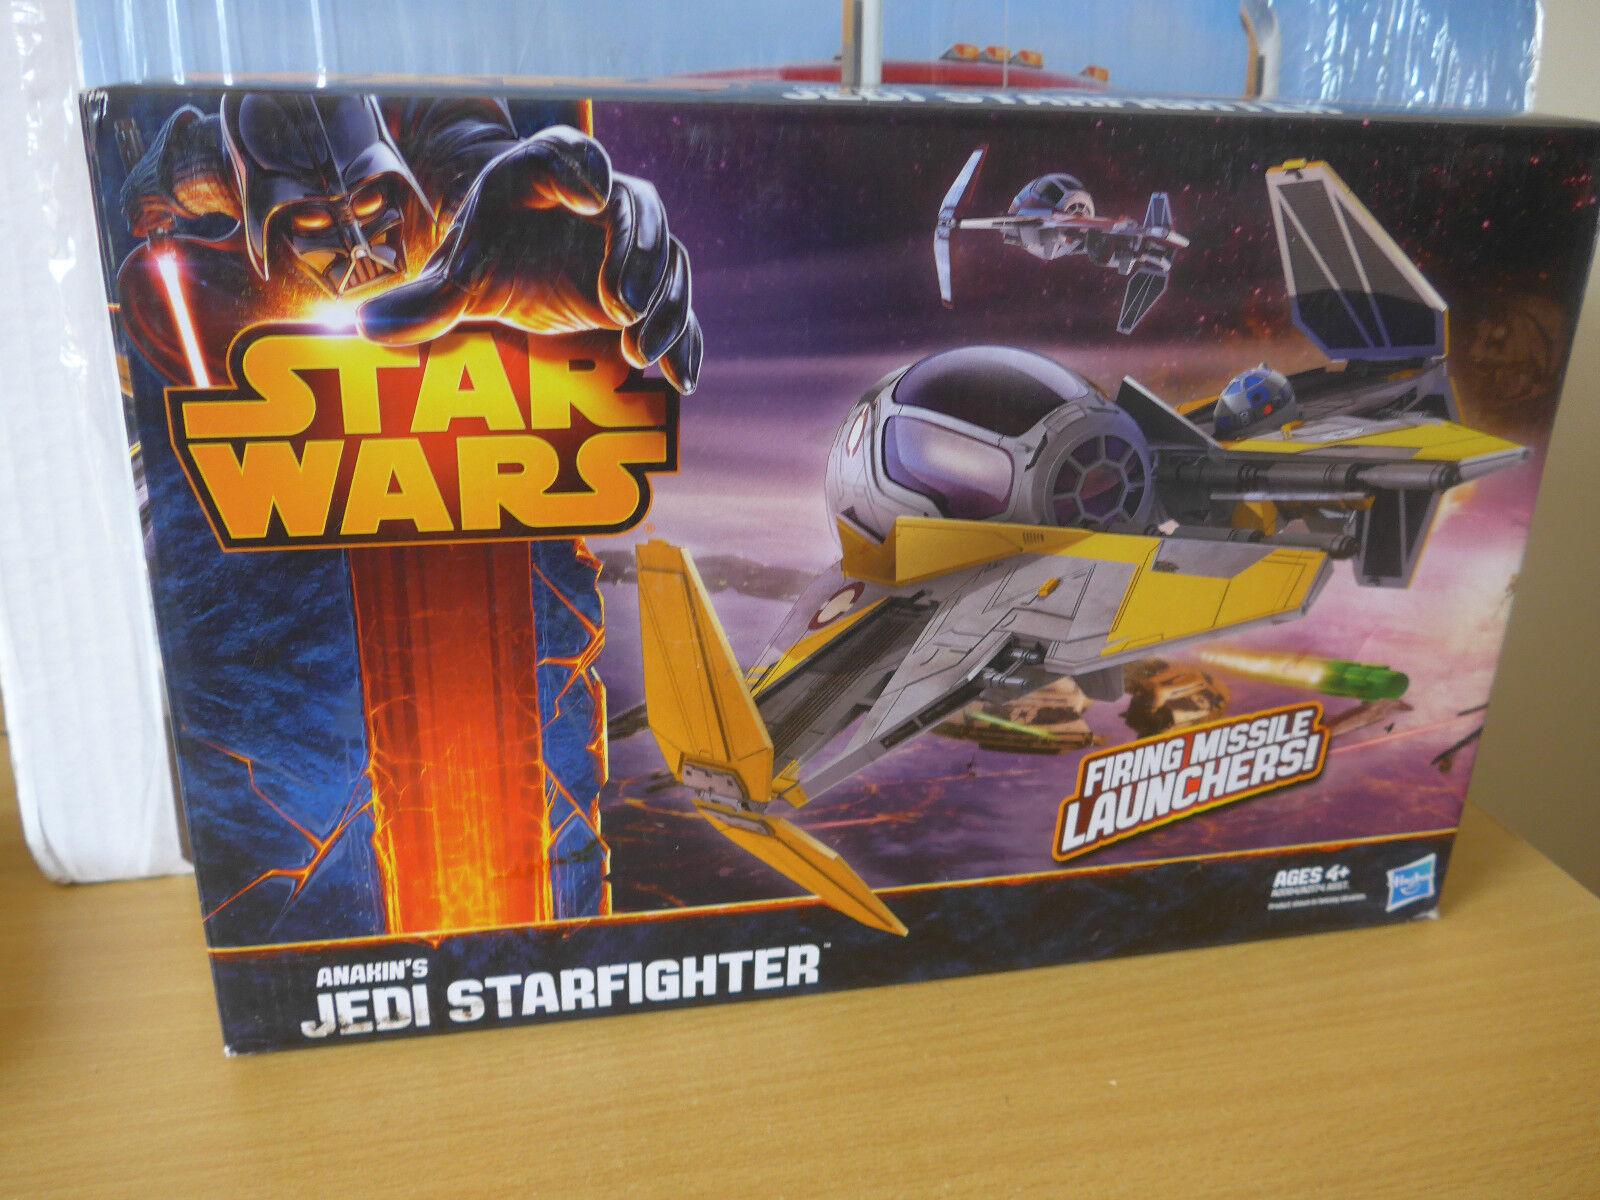 Star Wars Anakin,s Jedi Starfighter firing missile launchers action model yrs 4+